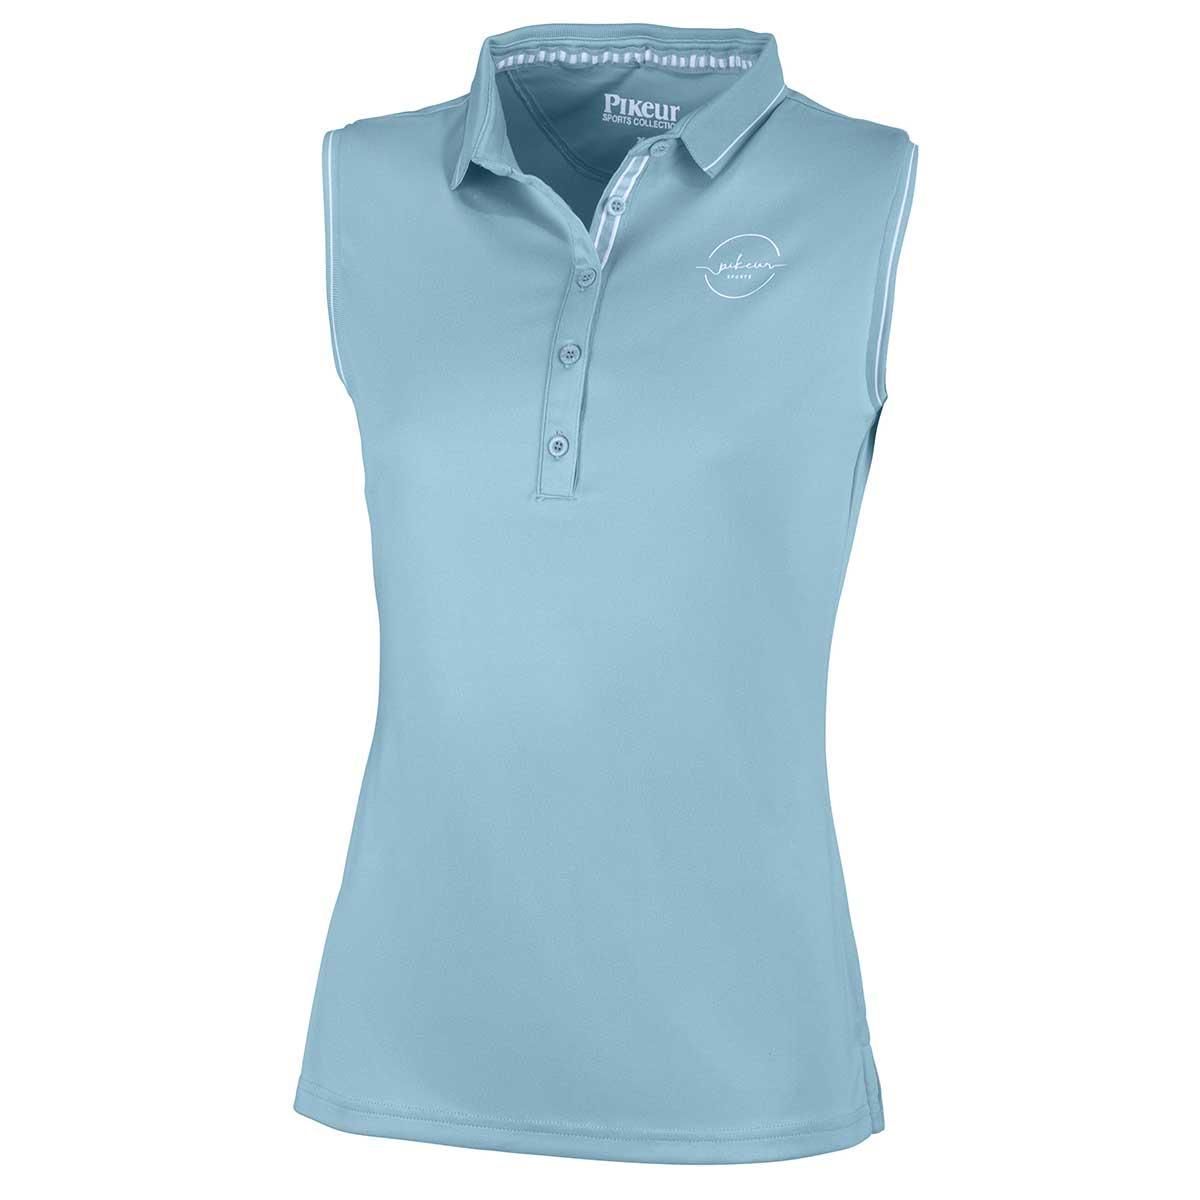 Pikeur Jarla aquamarine Sleeveless Top